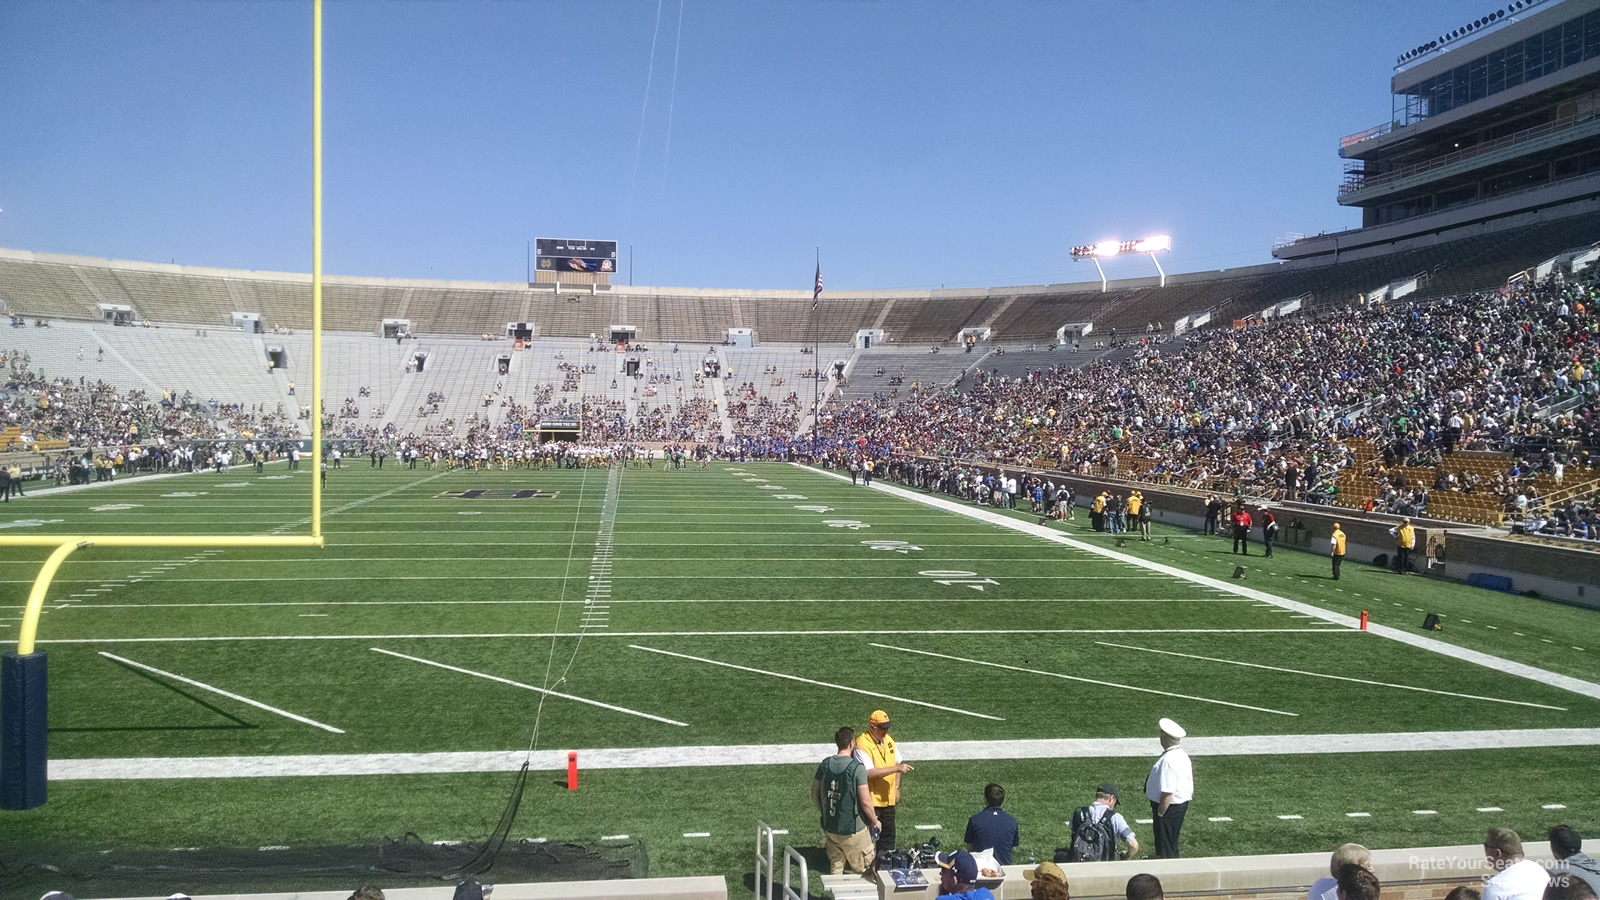 Notre Dame Stadium Section 18 - RateYourSeats.com